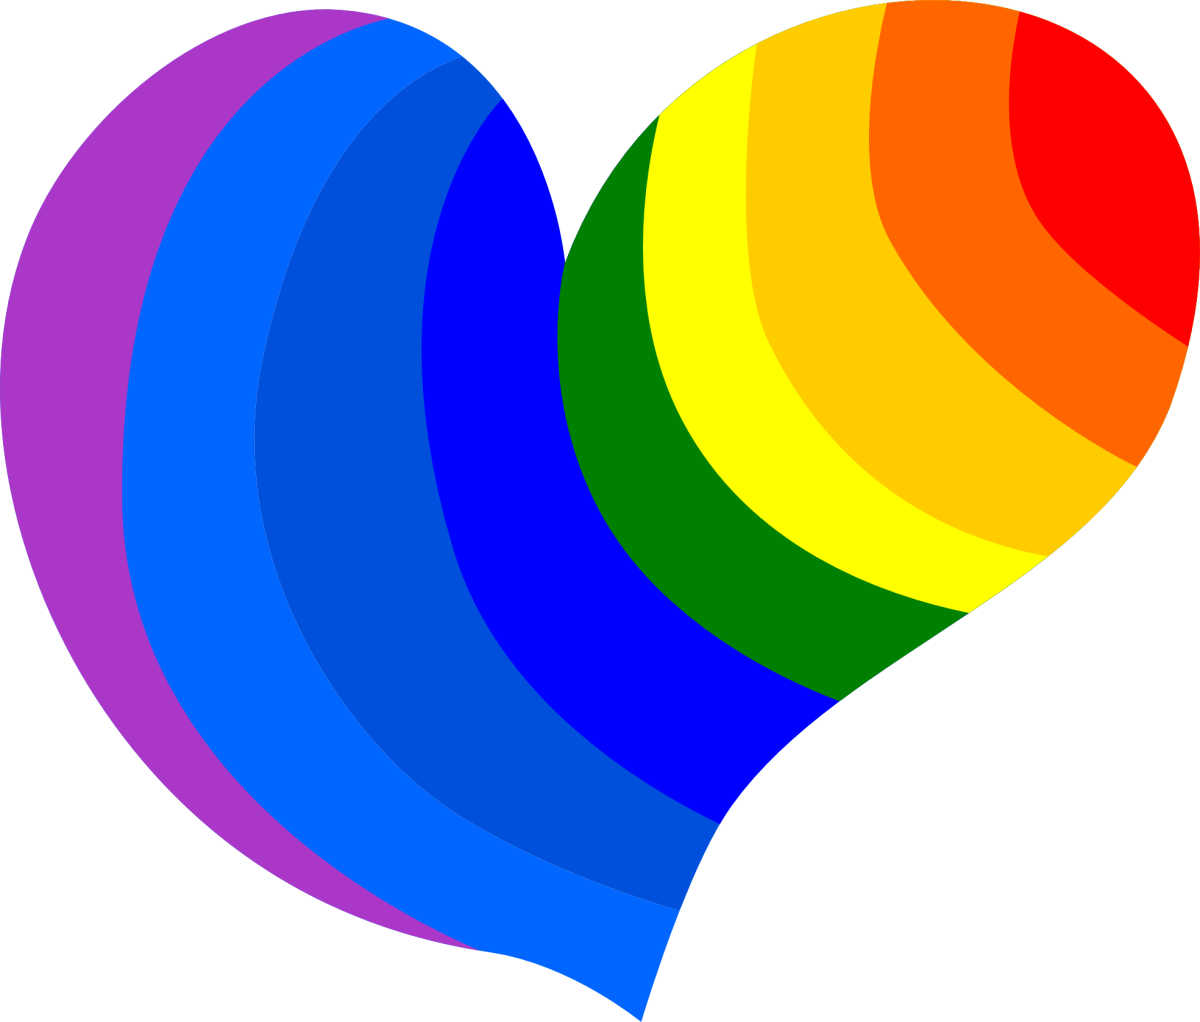 Rainbow Heart Design